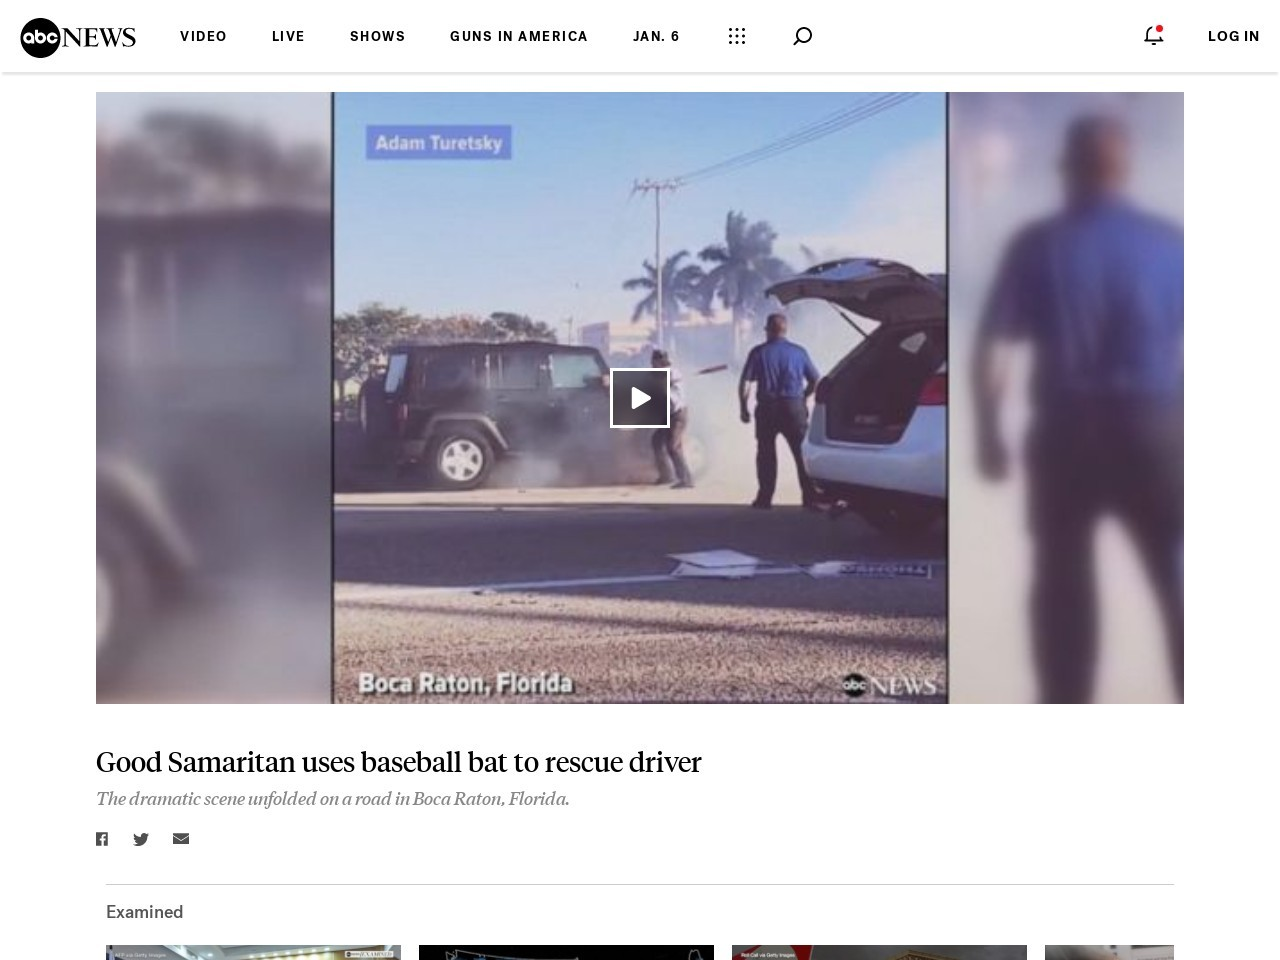 WATCH:  Good Samaritan uses baseball bat to rescue driver